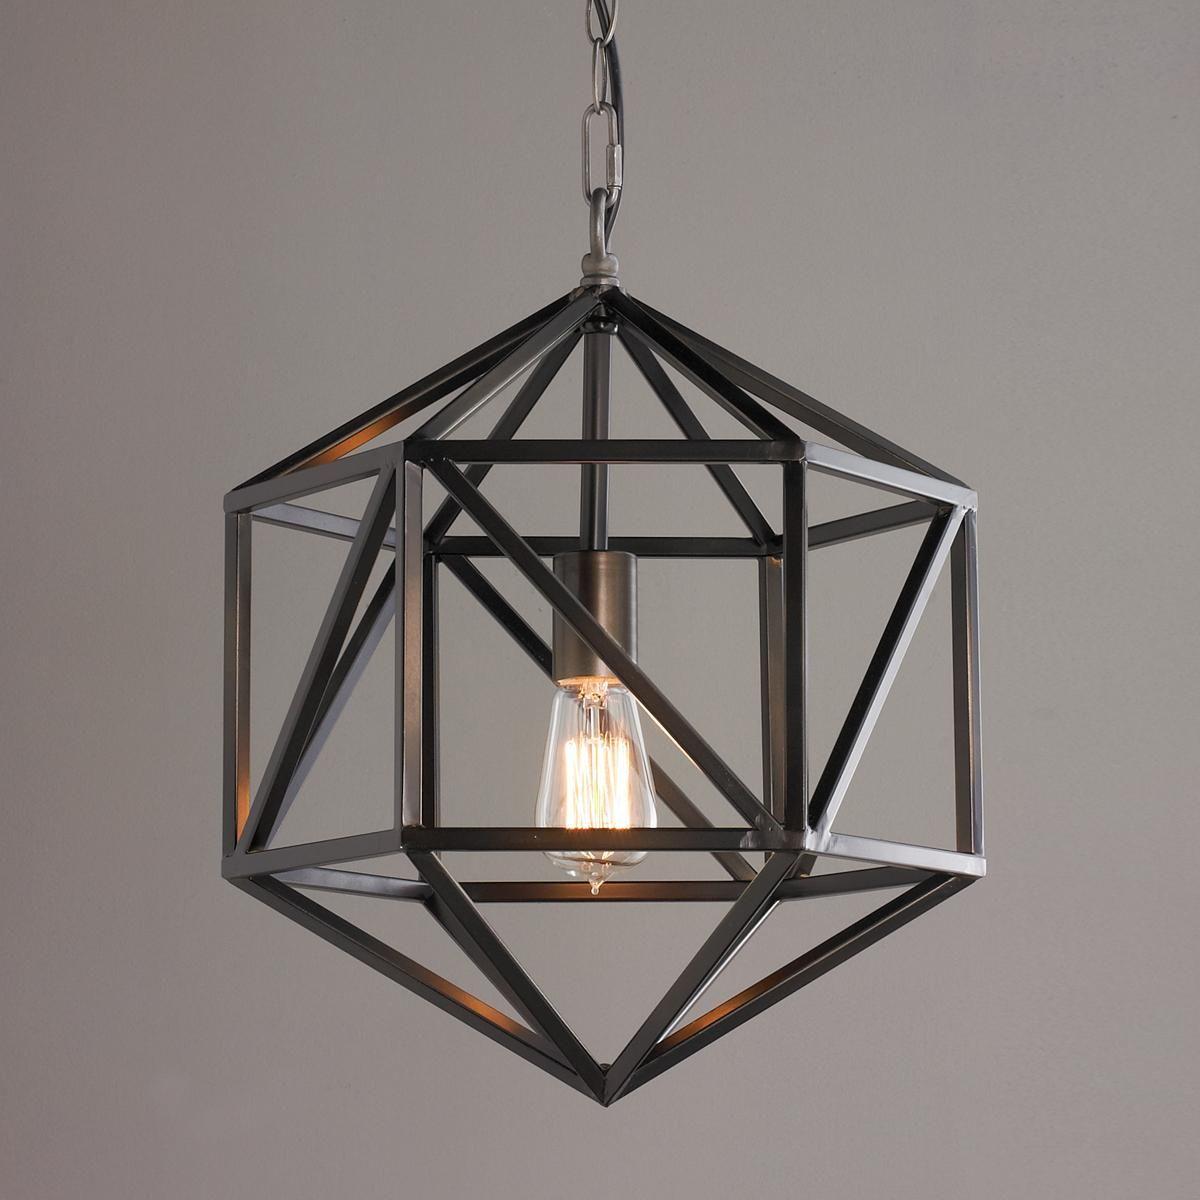 Prism Cage Pendant Light | 圖集 | Pinterest | Pendant lighting, Open ...